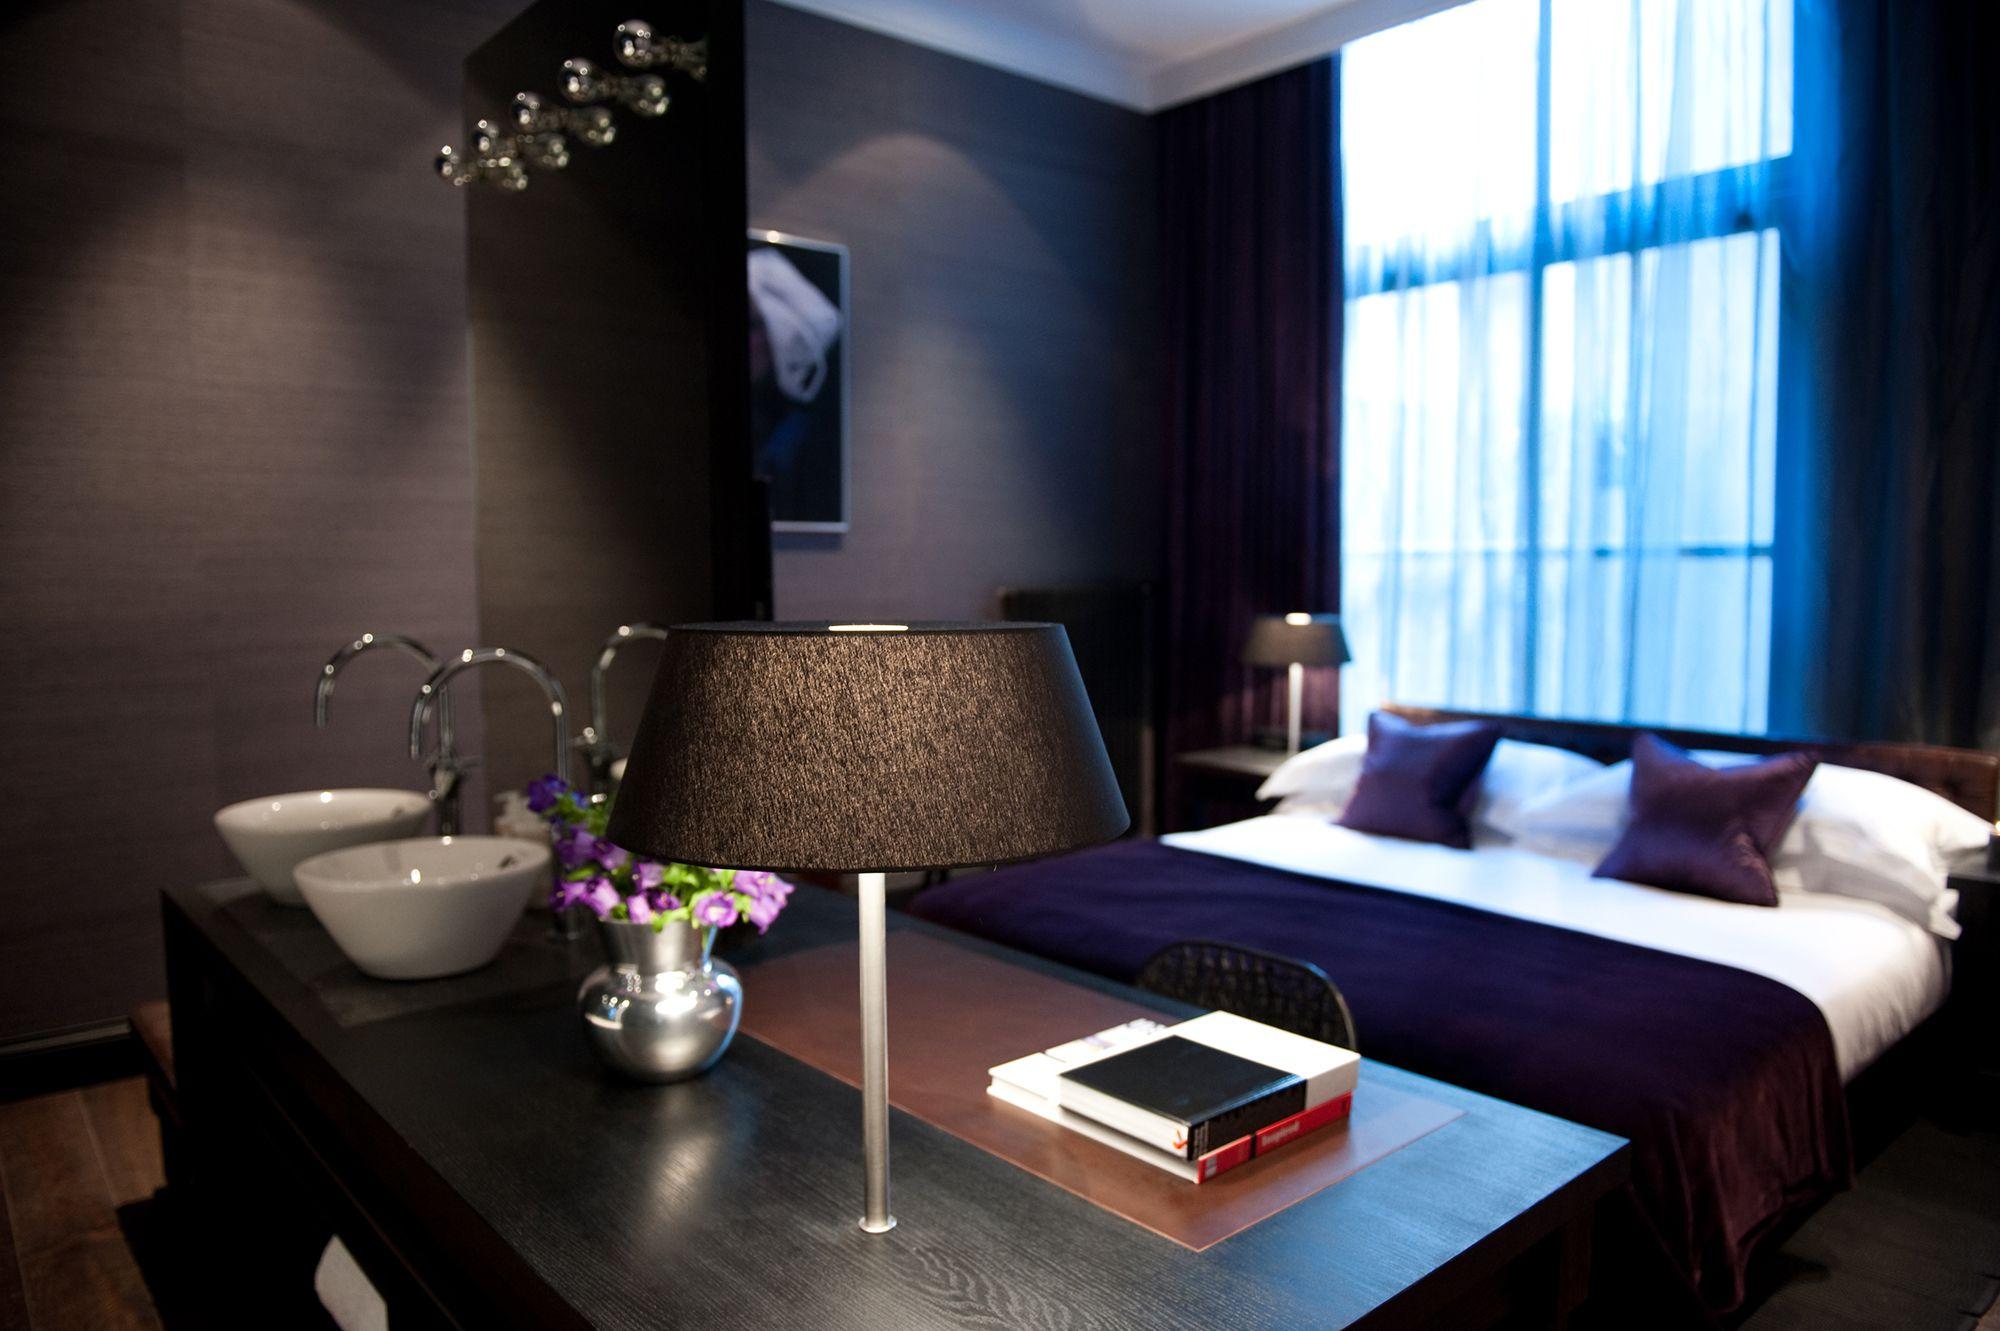 better room_2 - © amy murrell-21